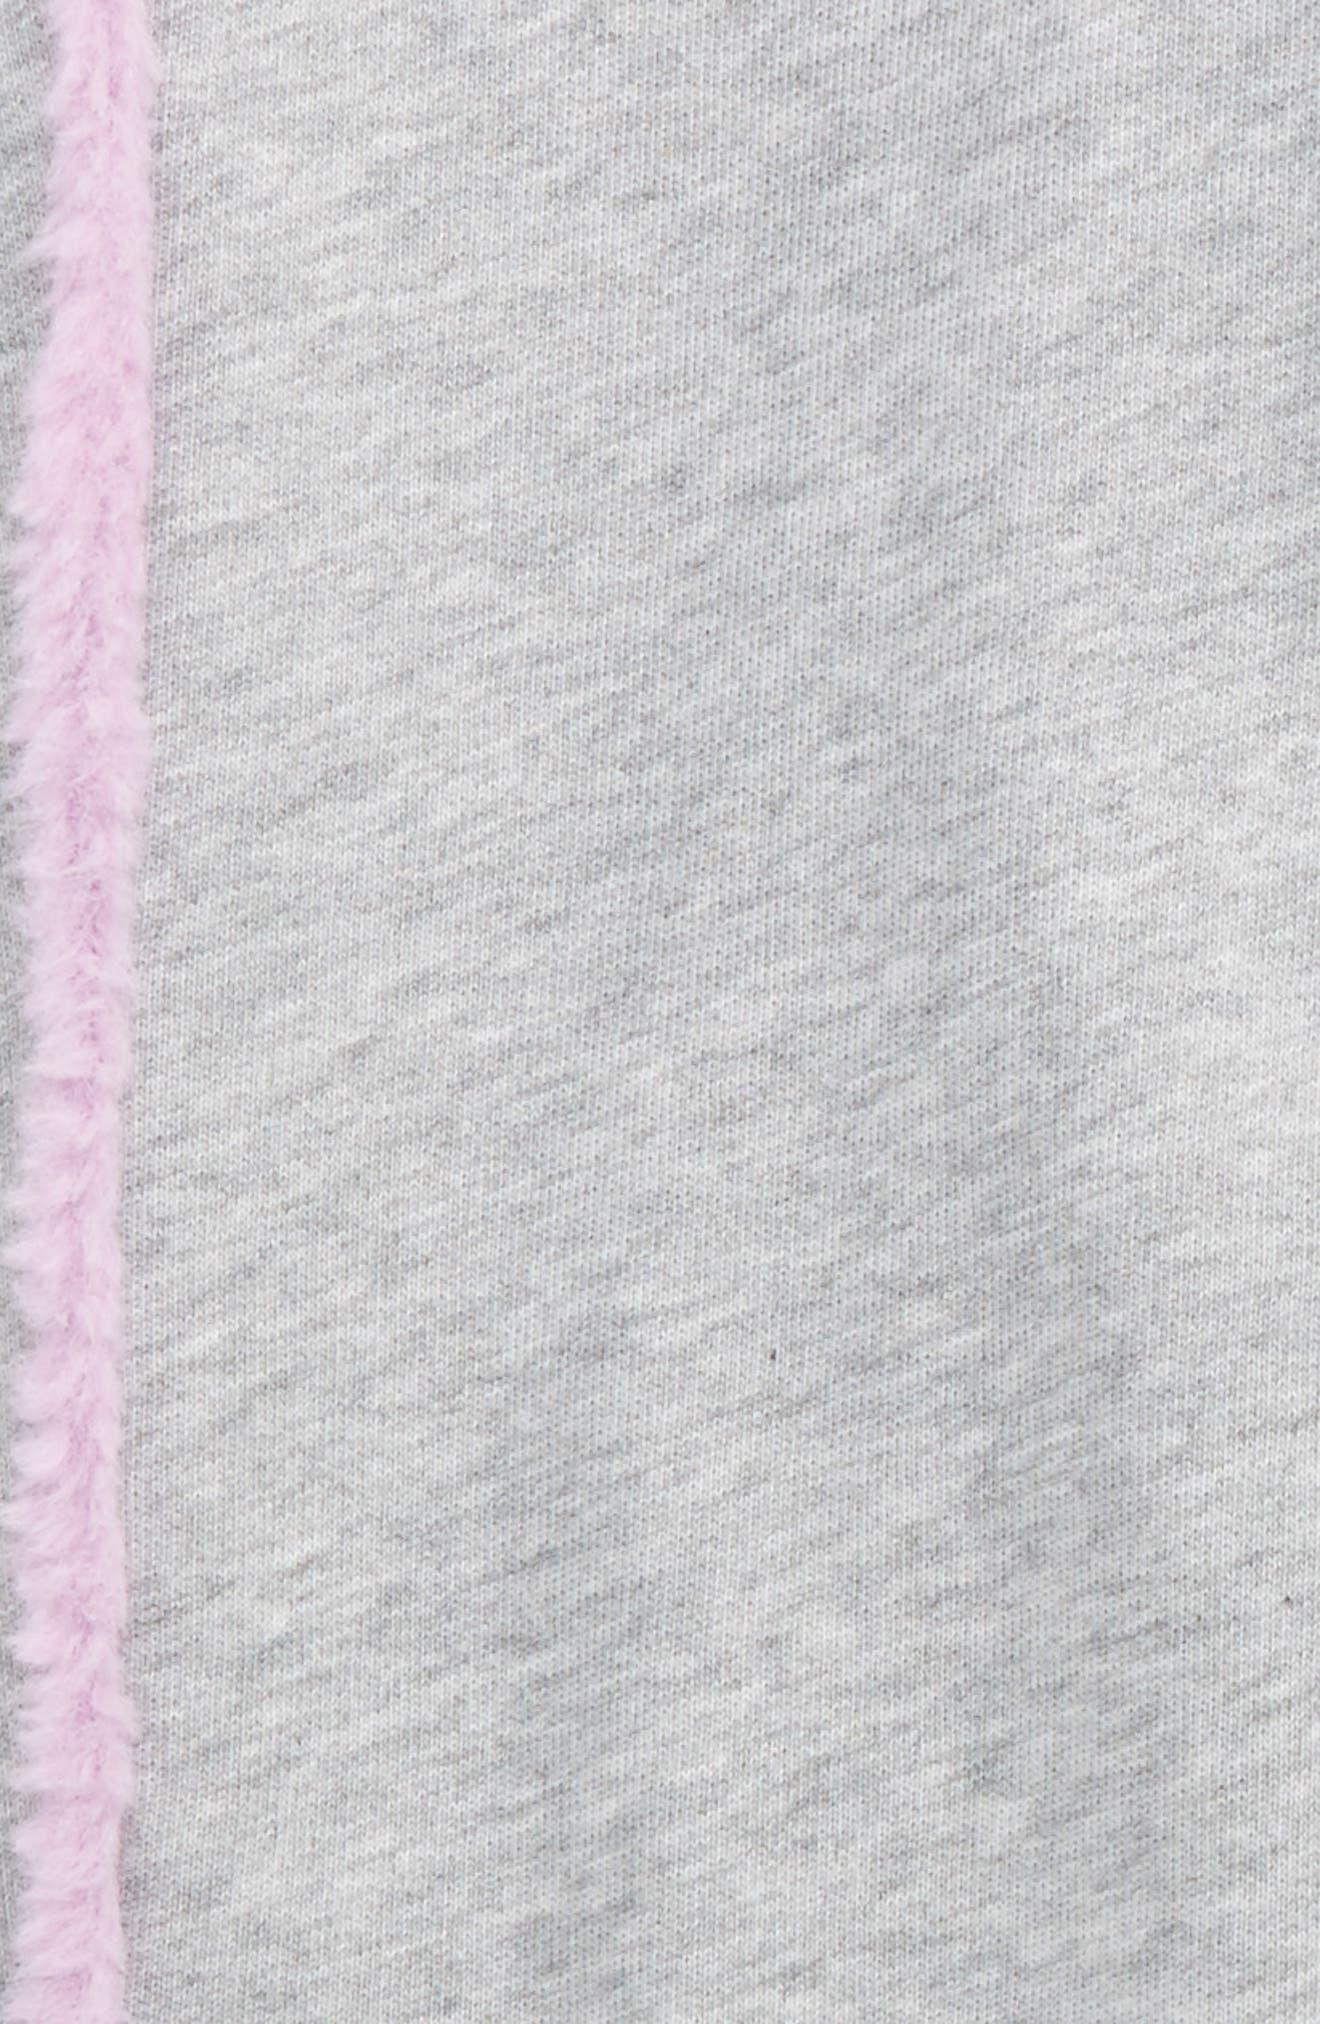 Alternate Image 2  - Juicy Couture Faux Fur Trim Jogger Pants (Big Girls)